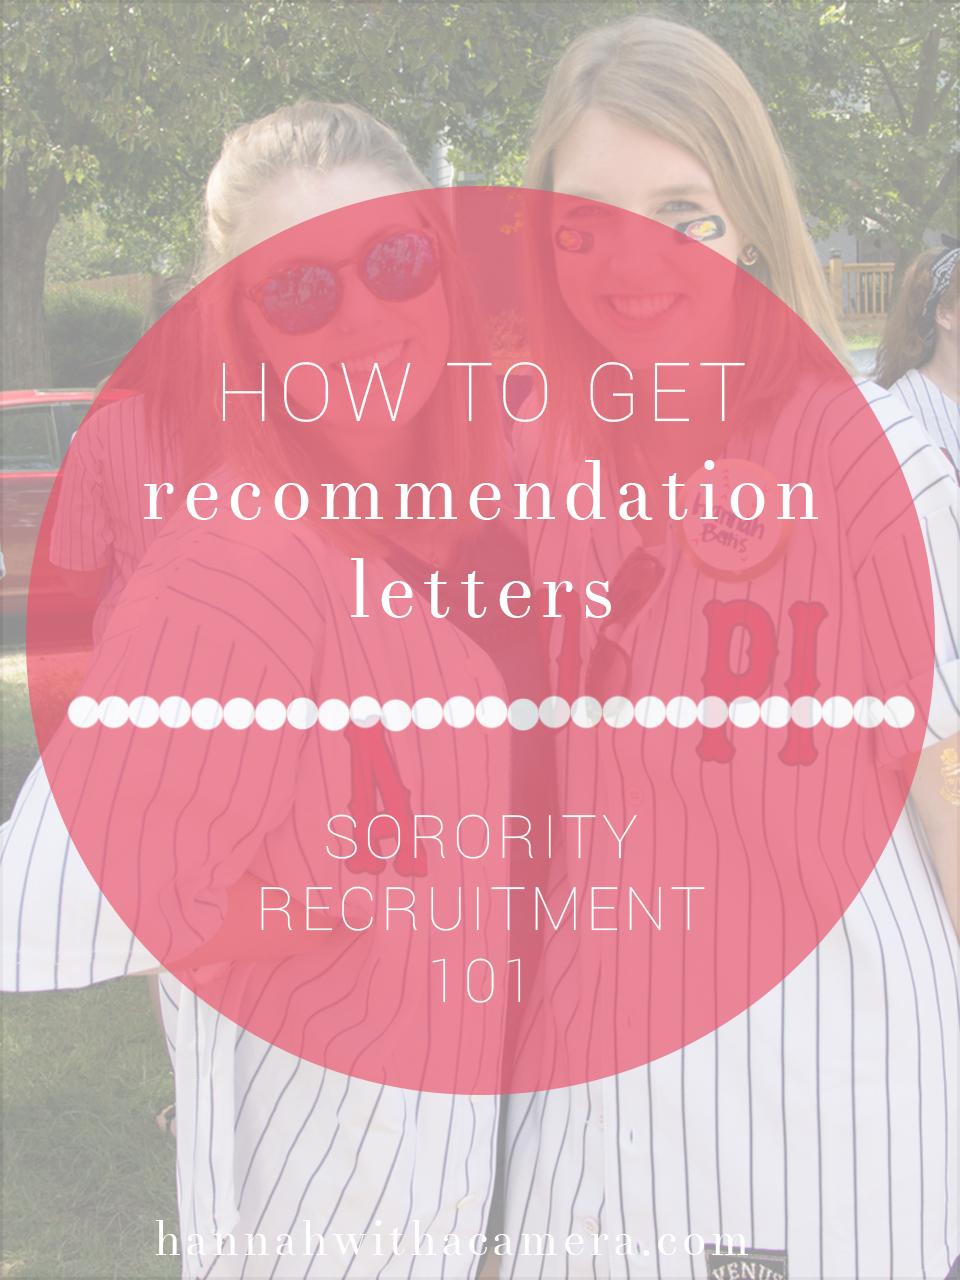 How to get recommendation letters sorority recruitment 101 altavistaventures Images